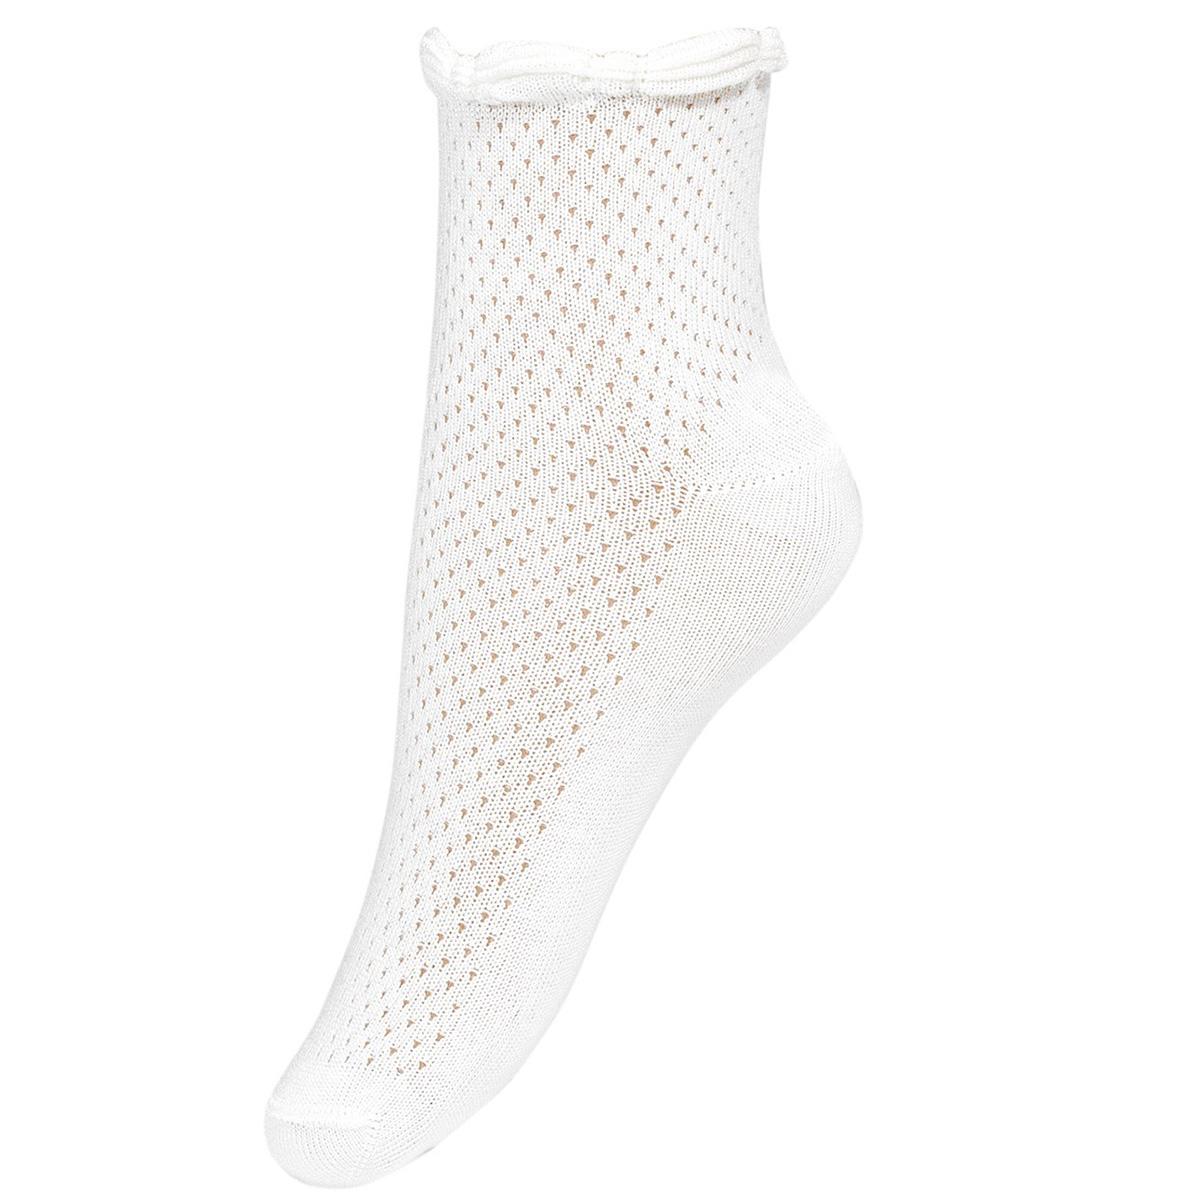 Girls Summer Dress Socks In White With Braided Pattern